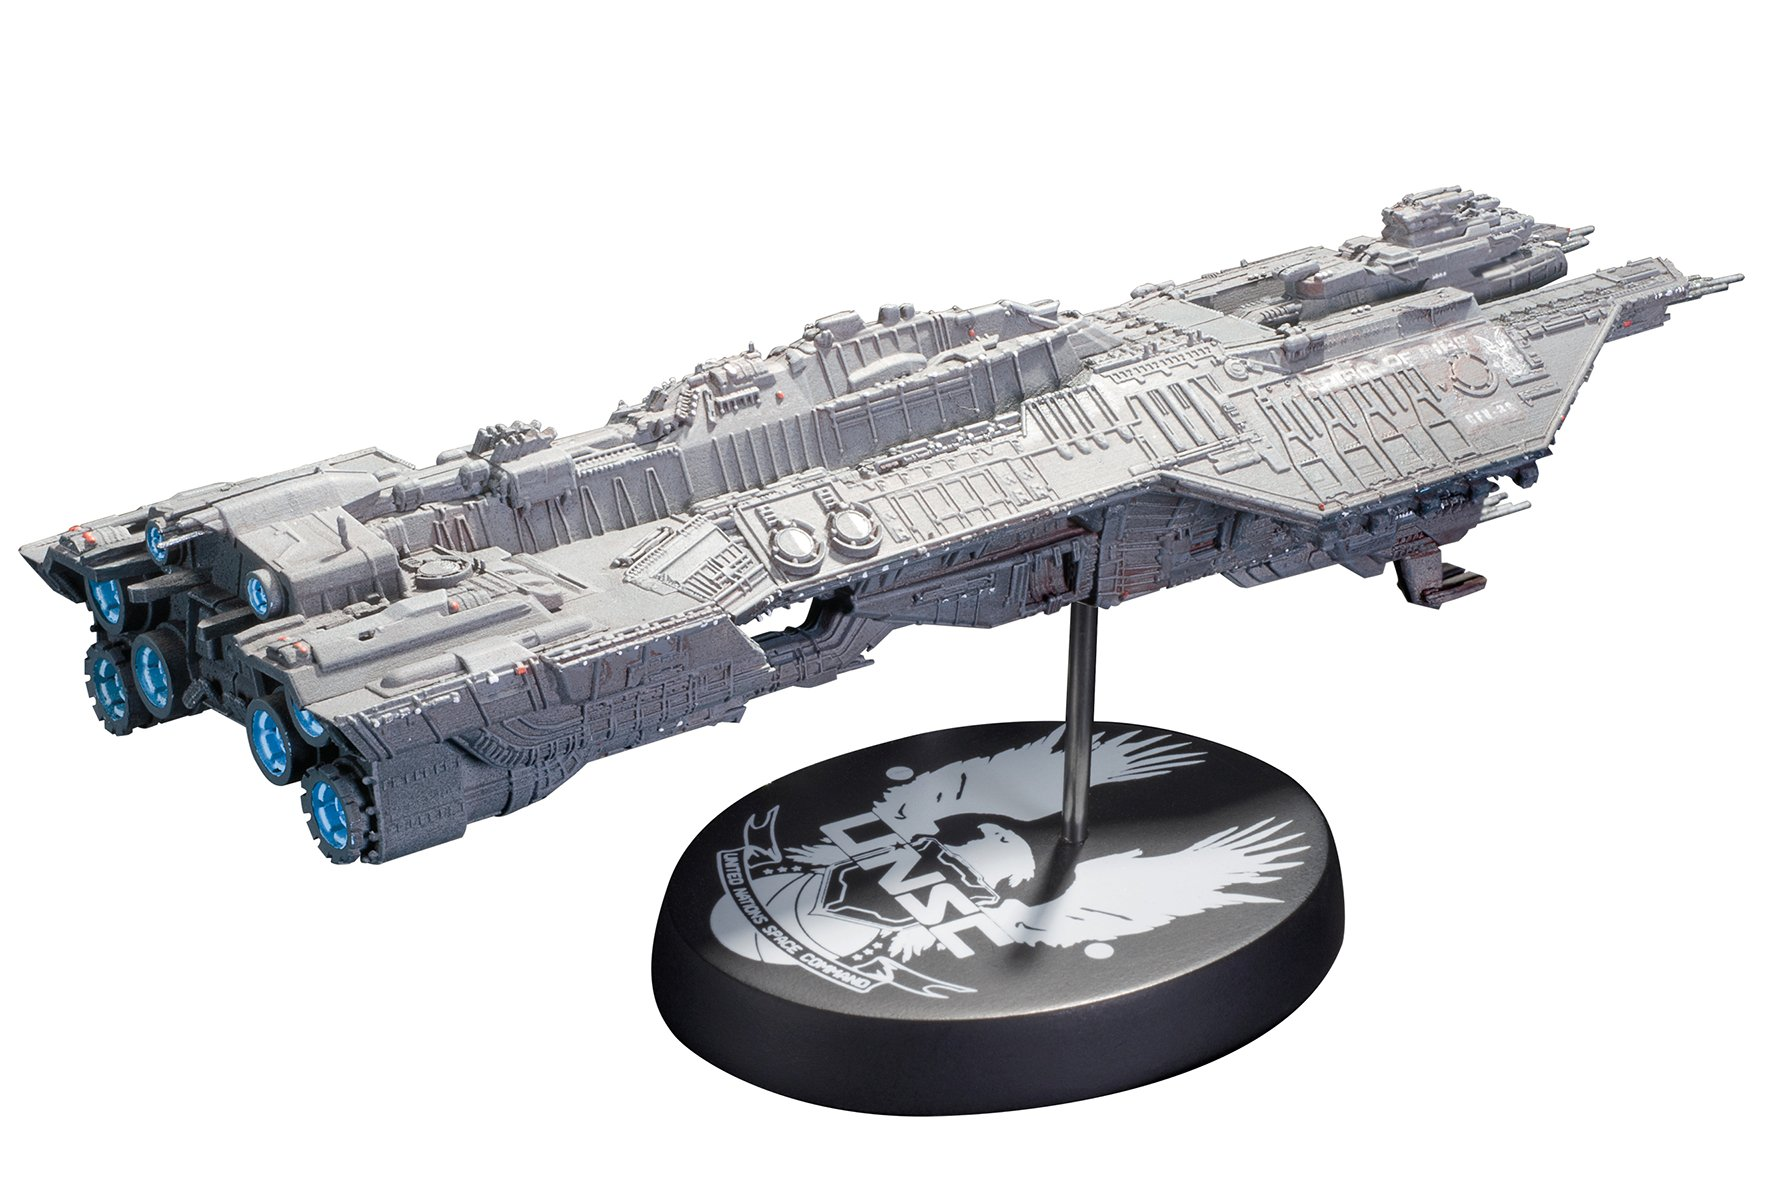 Dark Horse Deluxe Halo Covenant Truth /& Reconciliation Ship Replica Vehicle NEW